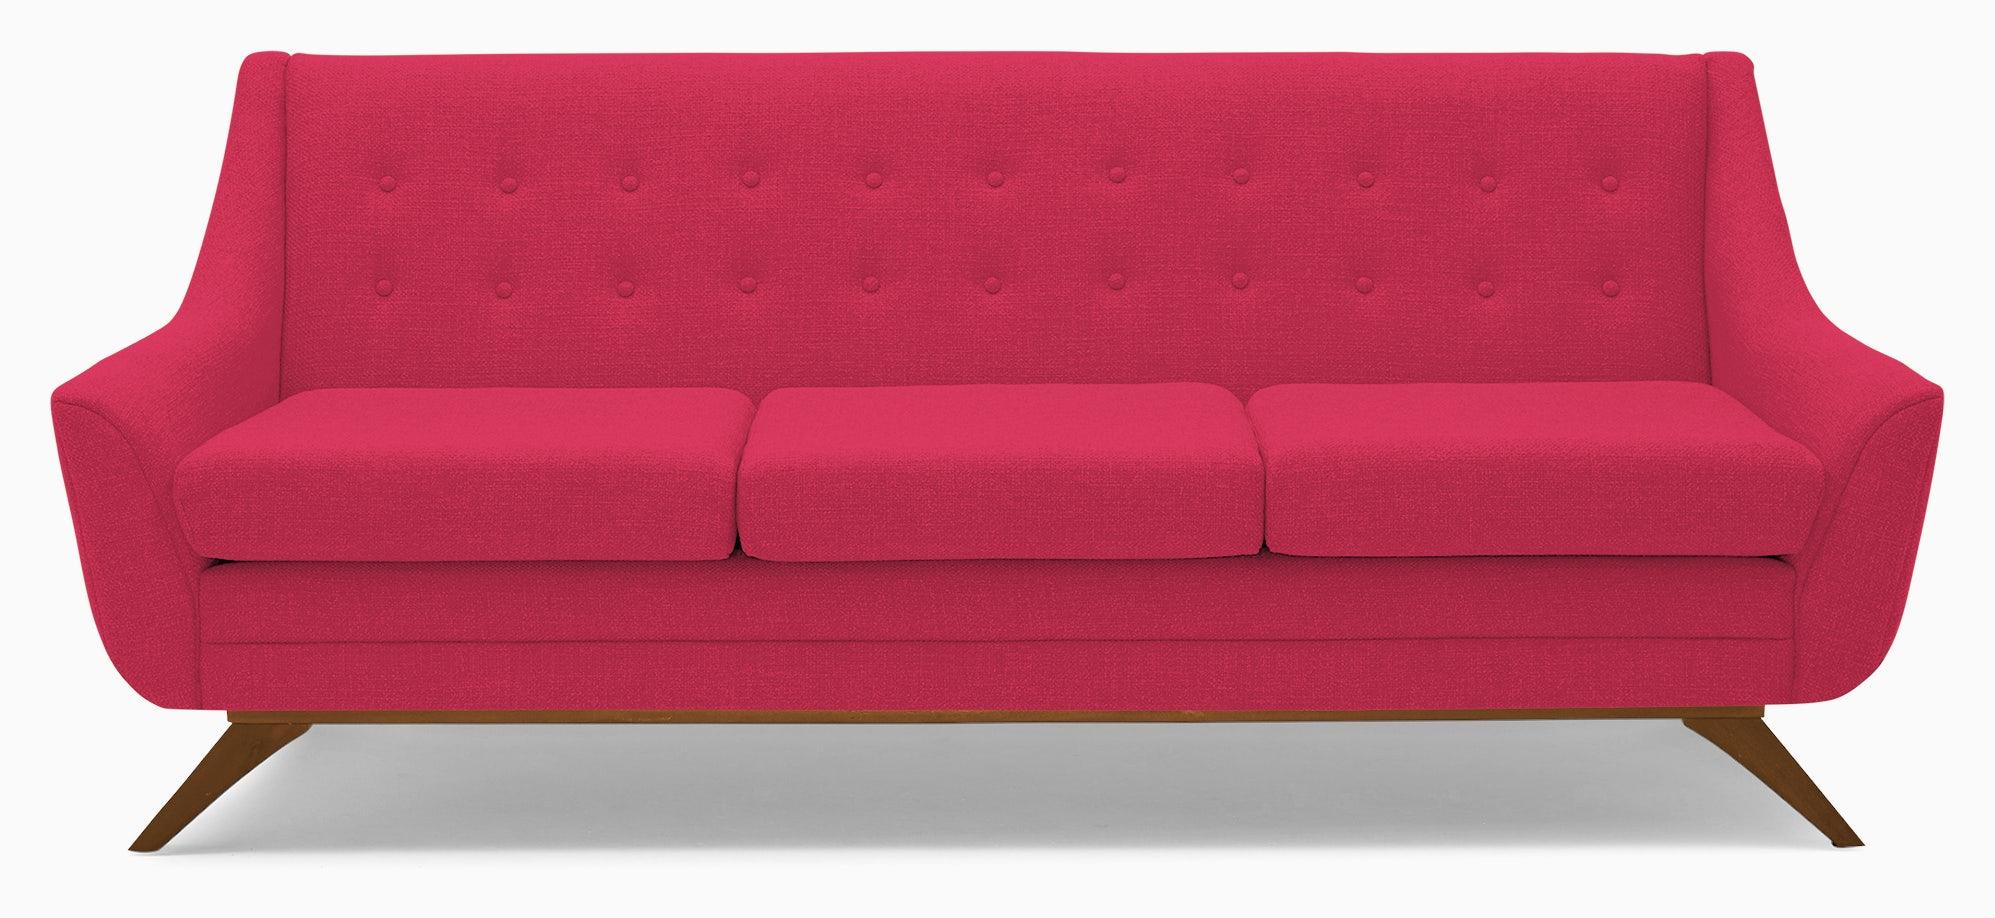 aubrey sofa key largo bubblegum